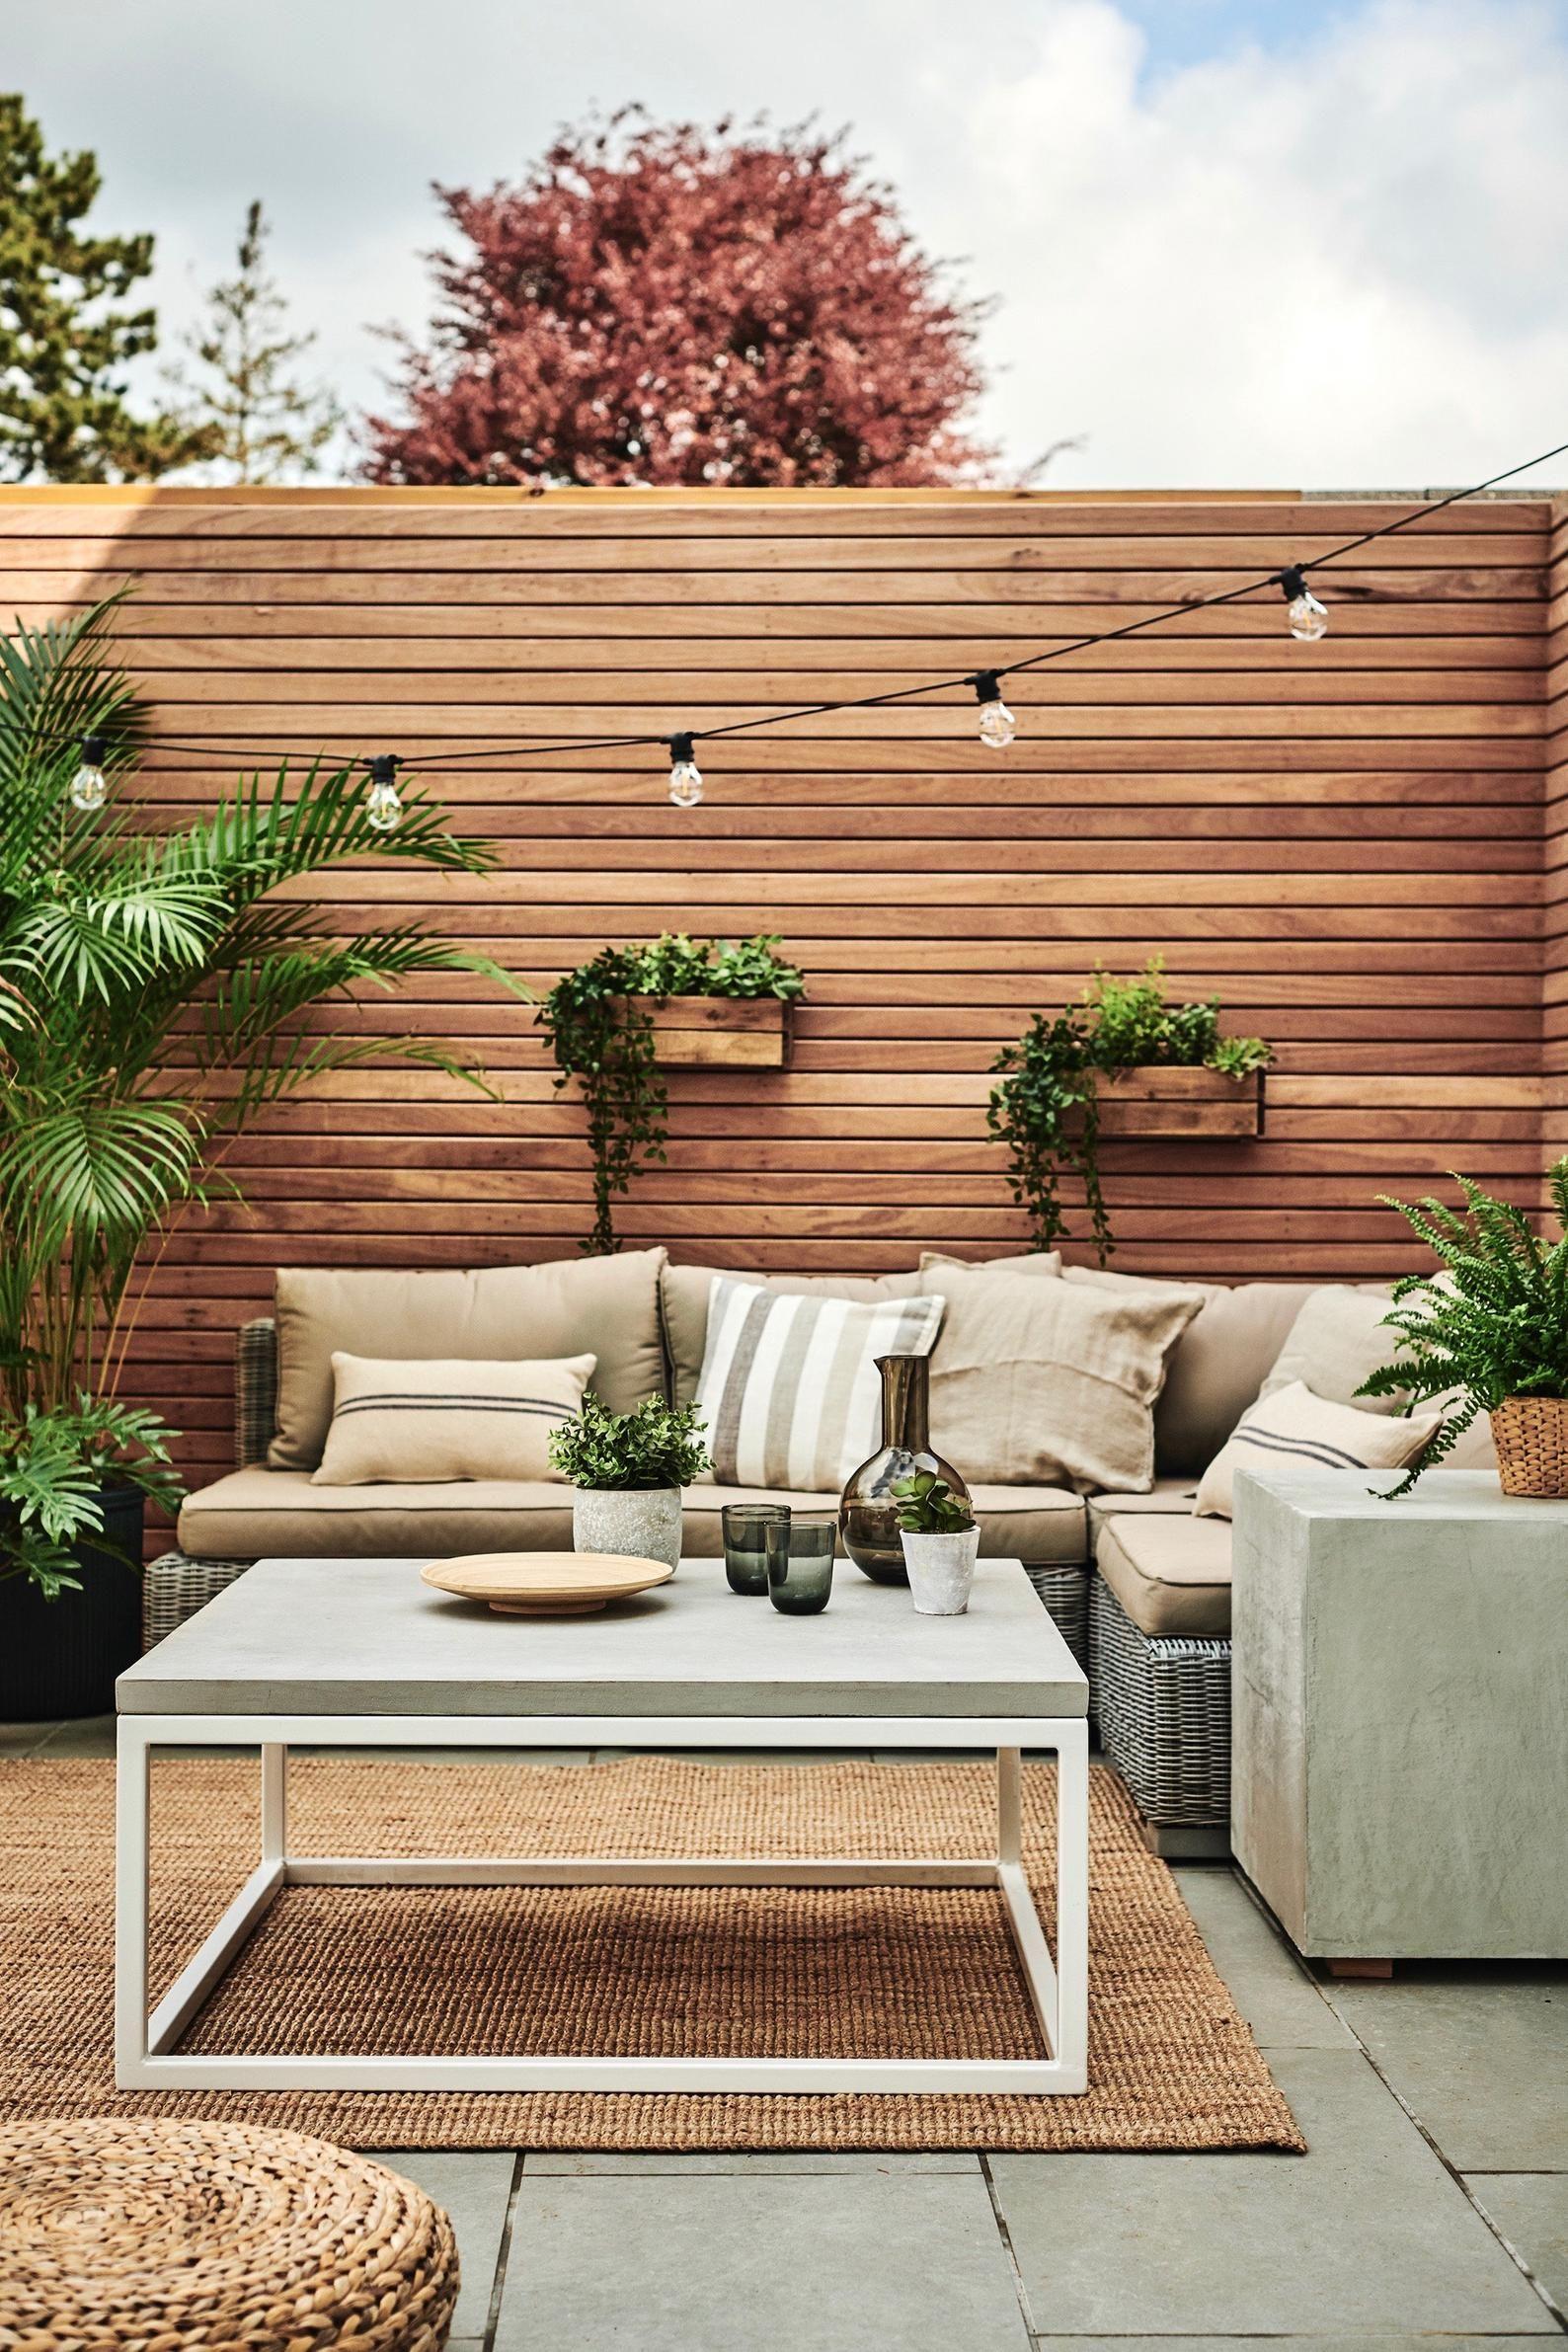 Concrete Cube Outdoor Side Table In 2020 Backyard Seating Backyard Outdoor Gardens Design